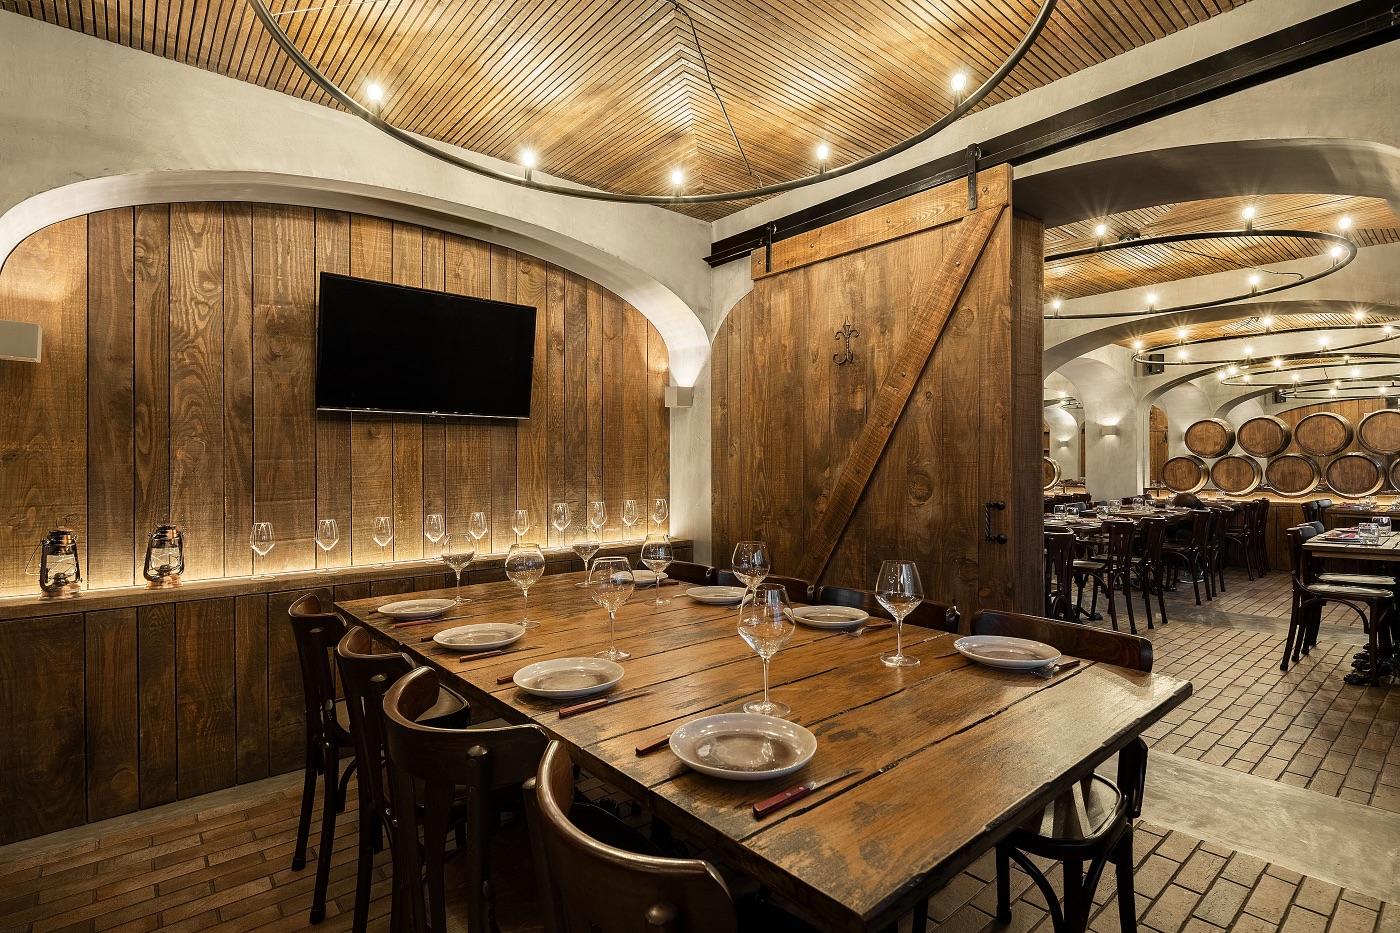 18_BARRIL Restaurant_PAULO MERLINI Architects_Inspirationist